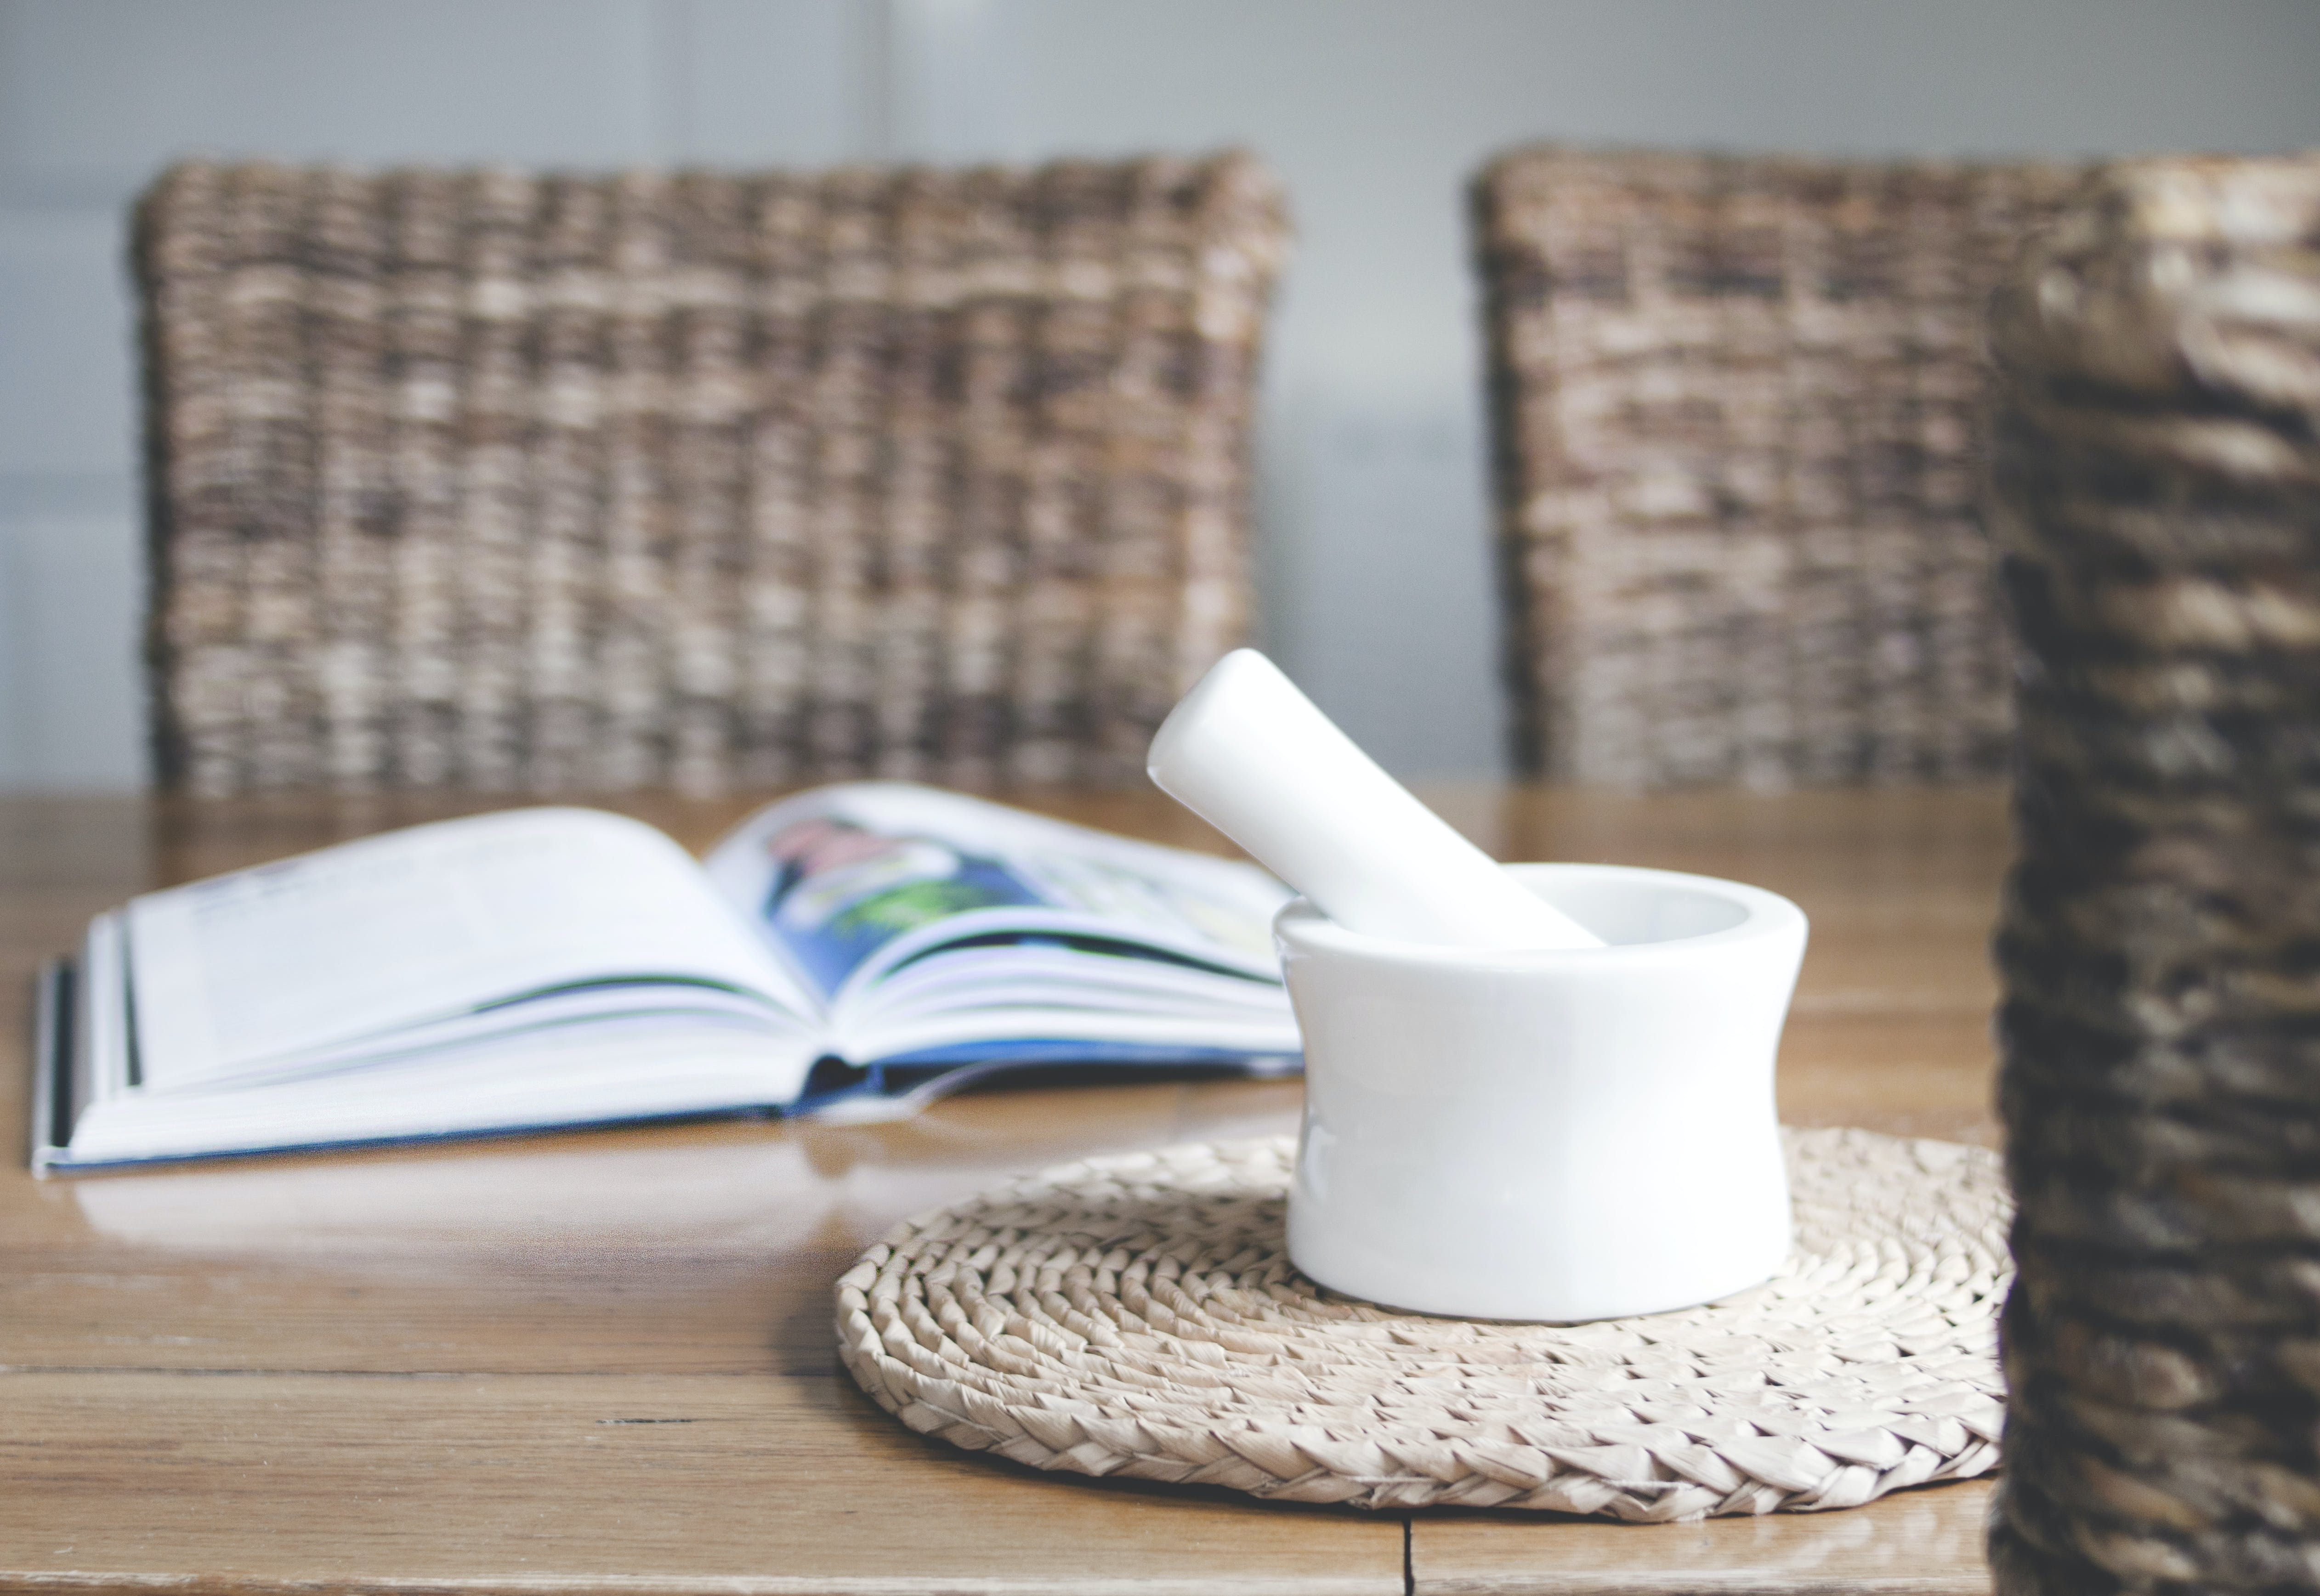 White Ceramic Mortar and Pestle Beside Book